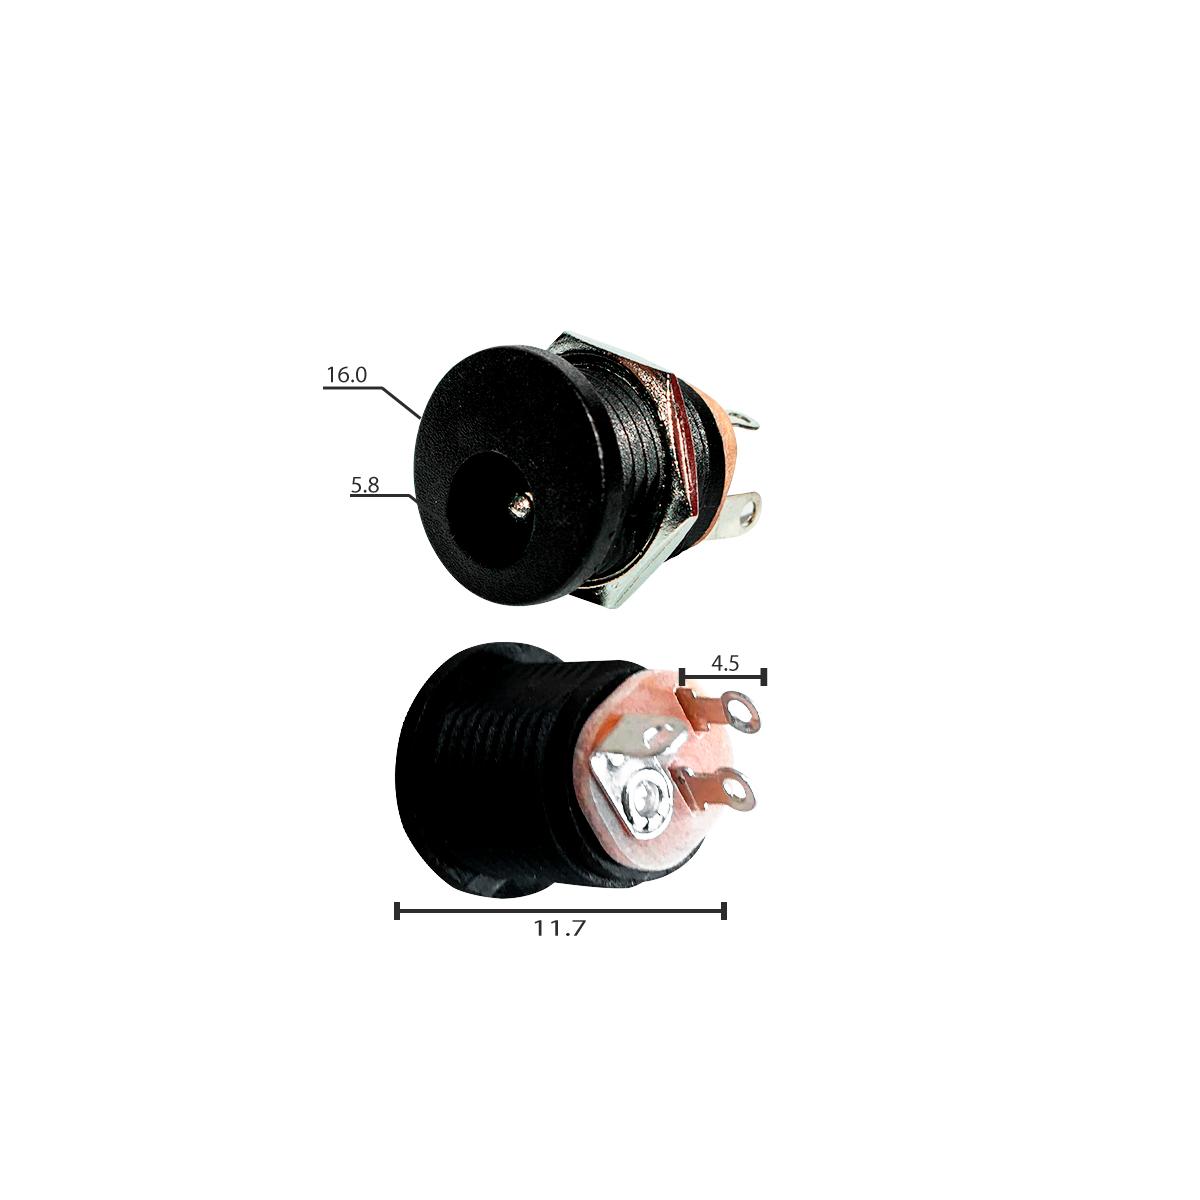 Kit 5 Unidades Conector Plug De Energia P4 Macho + 5 Unidades Plug Jack Tipo P4 Fêmea Com Rosca